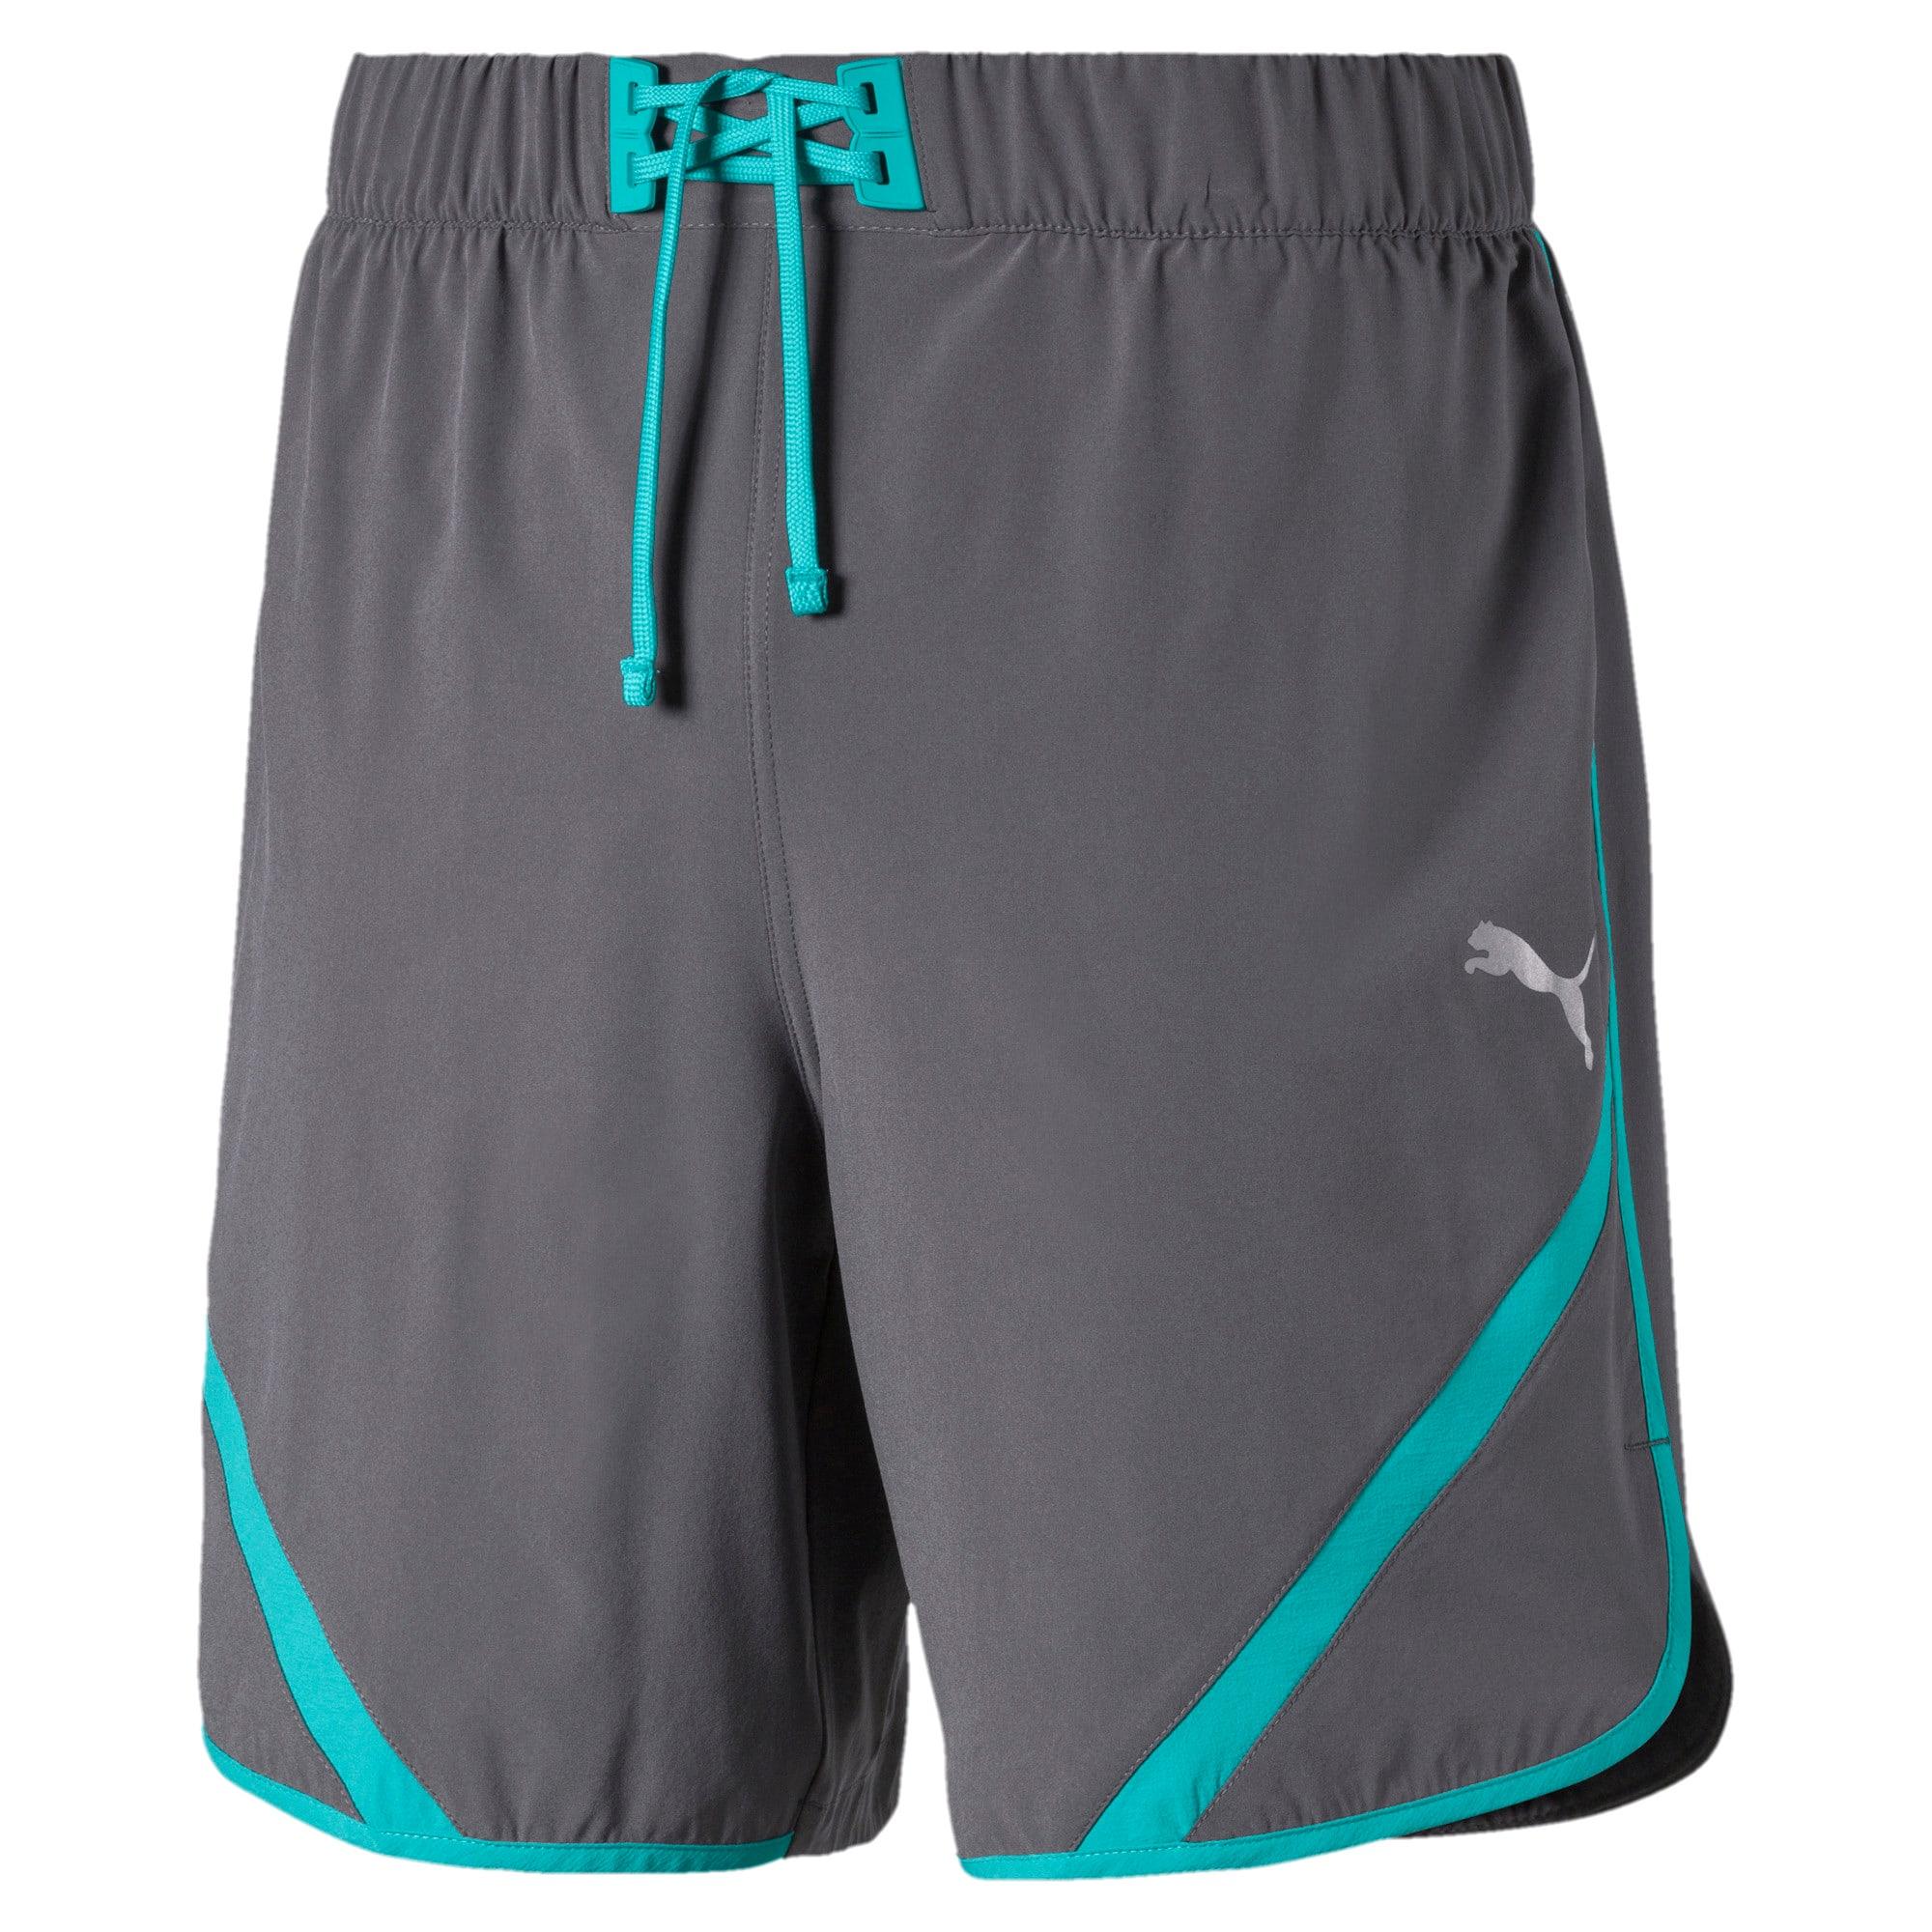 Thumbnail 1 of Get Fast Men's Shorts, CASTLEROCK-Blue Turquoise, medium